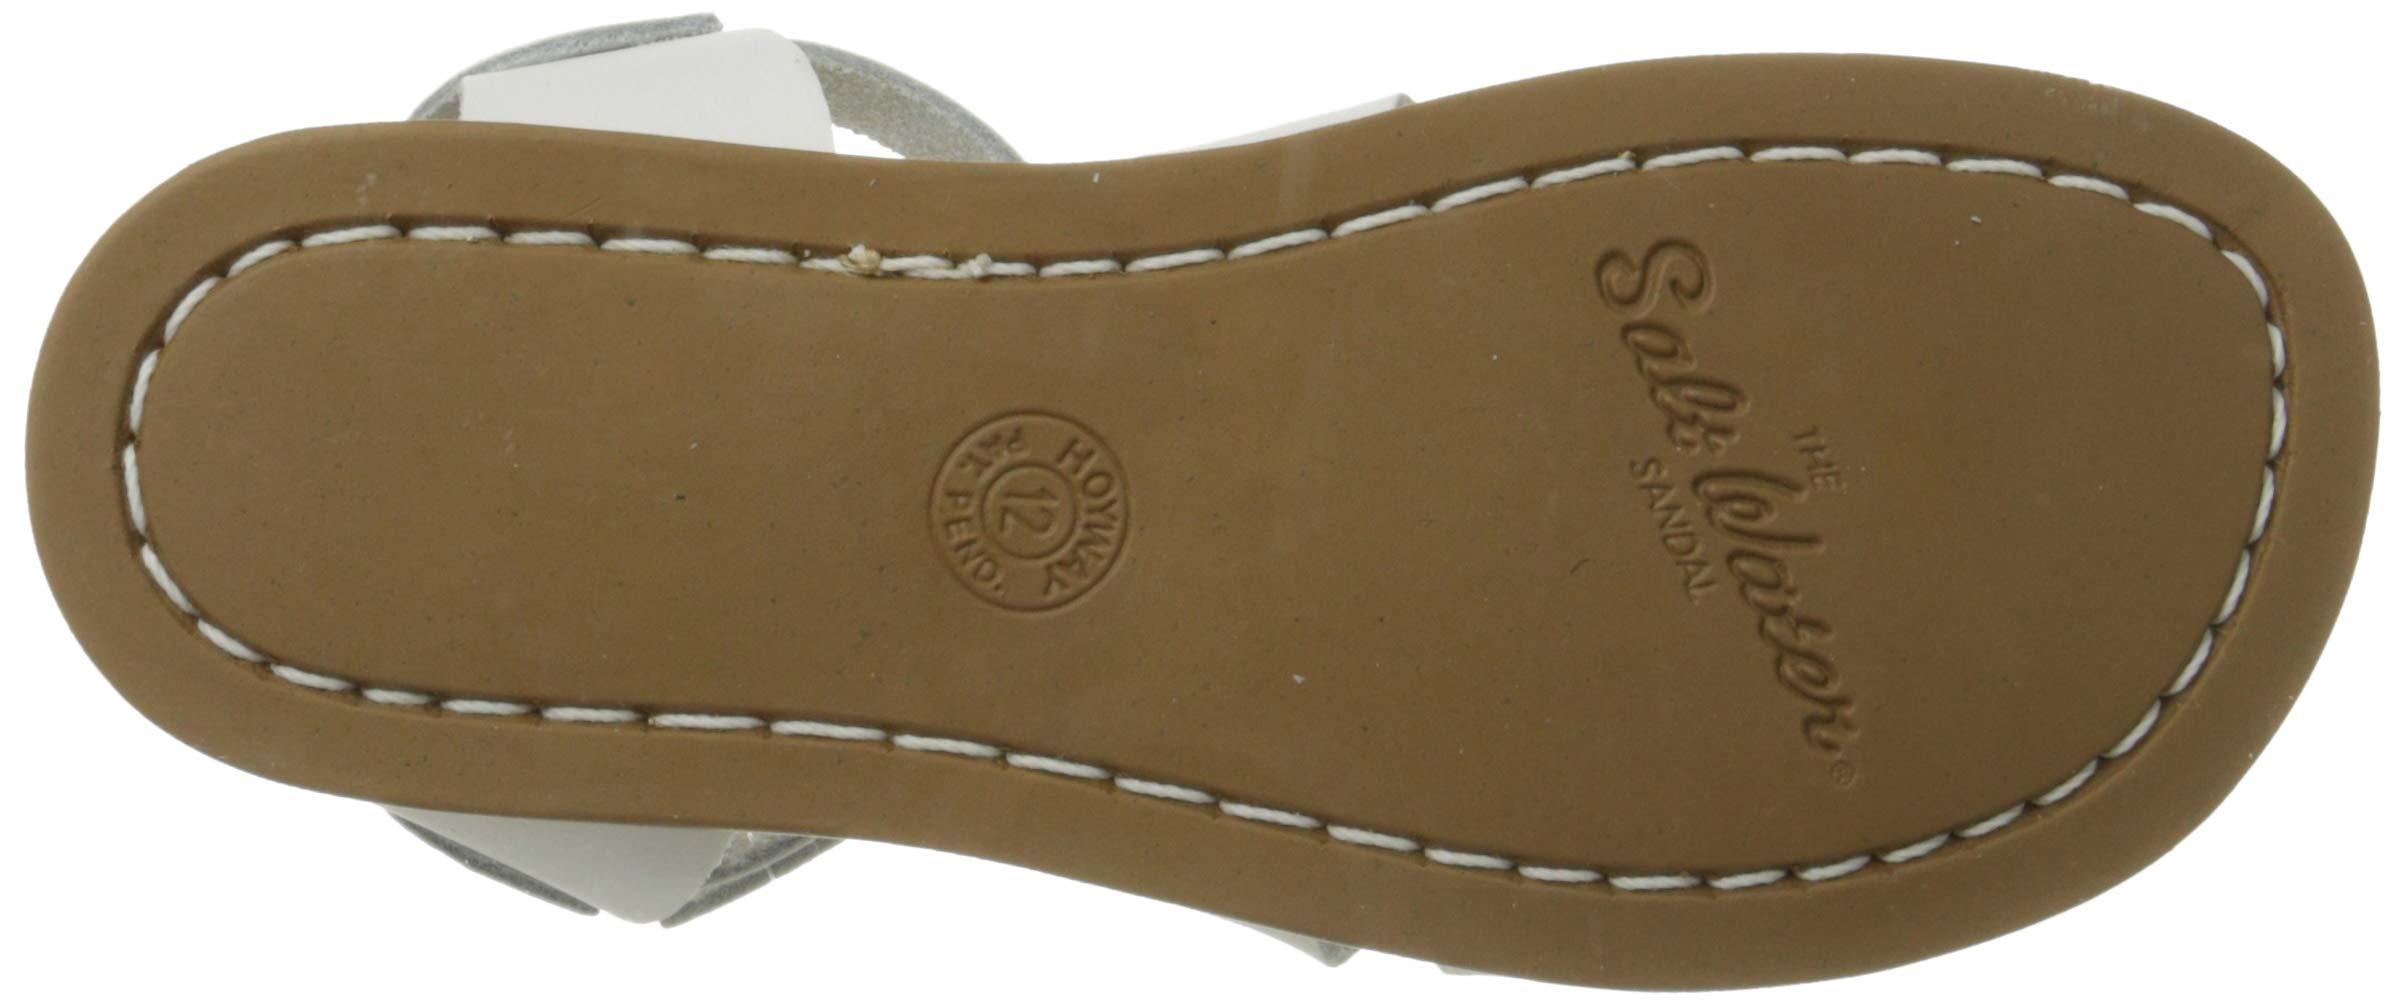 Salt Water Sandals by Hoy Shoe Original Sandal (Toddler/Little Kid/Big Kid/Women's), White, 13 M US Little Kid by Salt Water Sandals (Image #3)